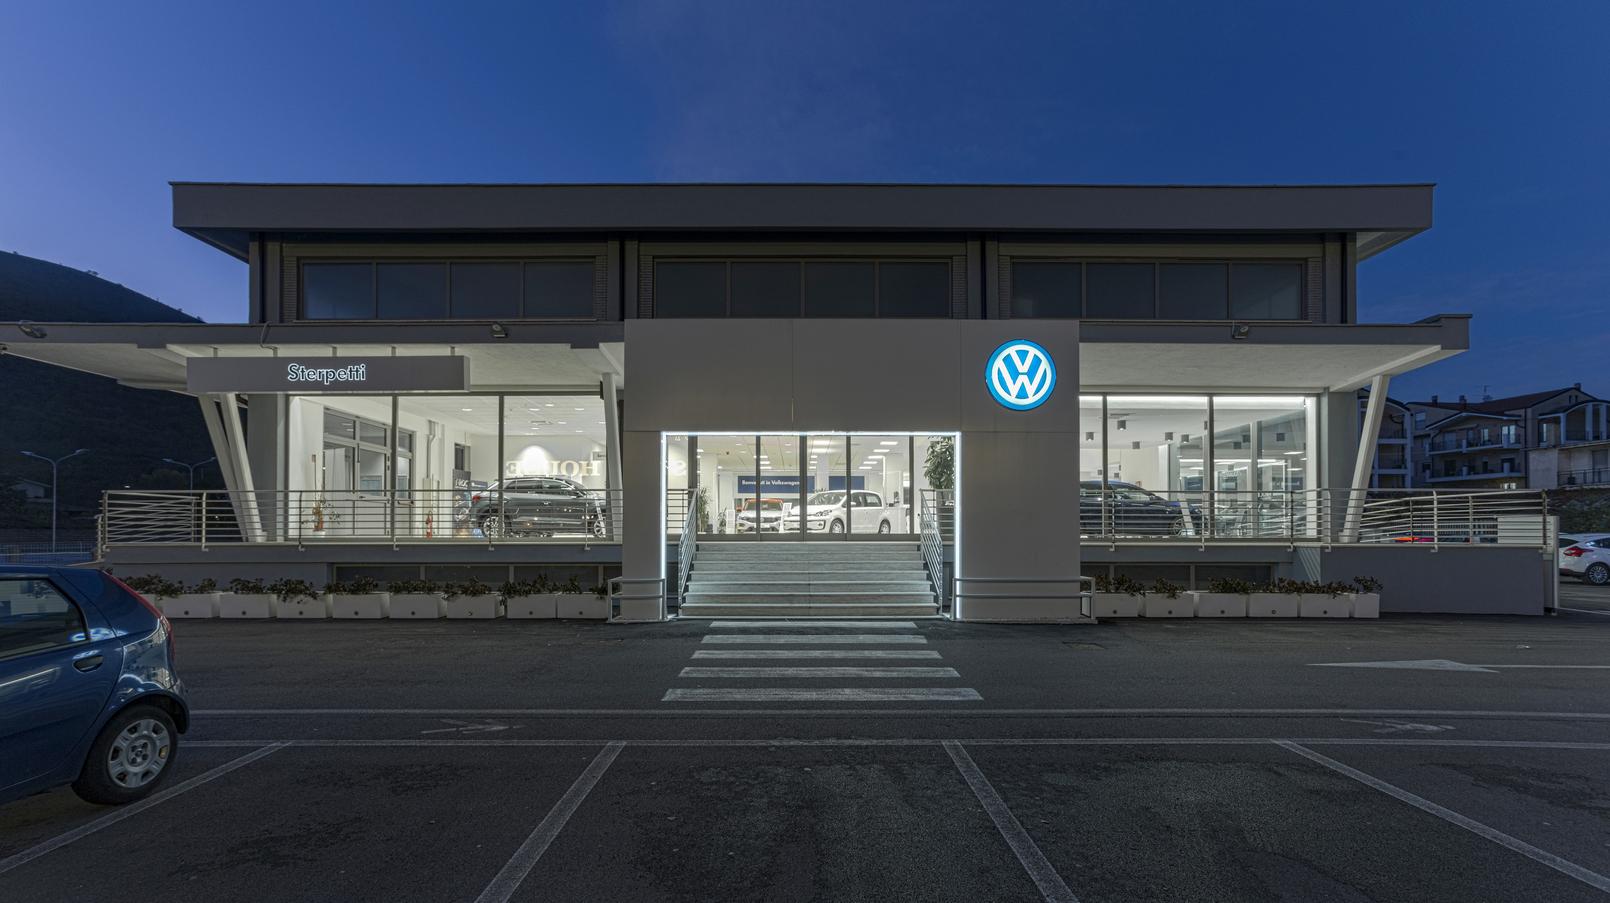 Volkswagen Dealer Studio Di Architettura Candeloro